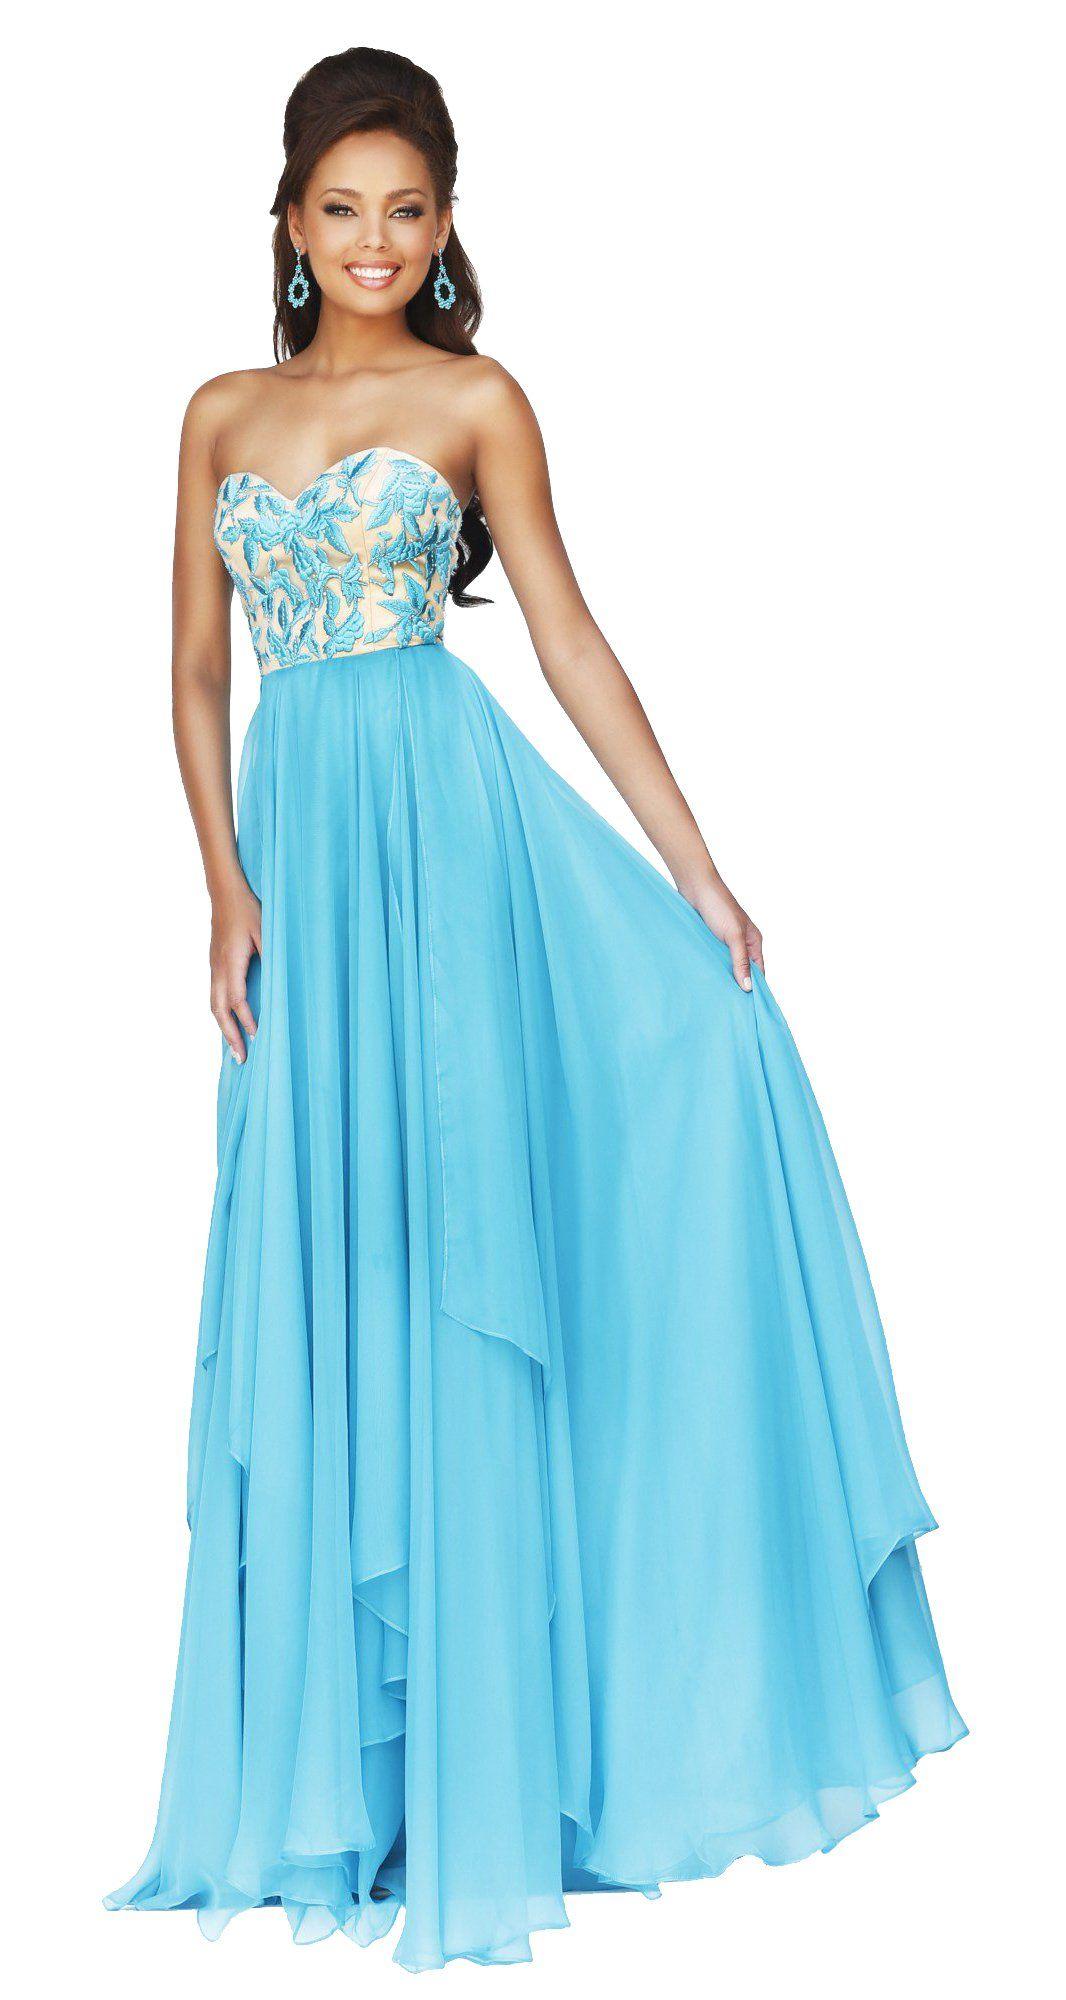 Sherri hill long prom dress turquoise fav dresses